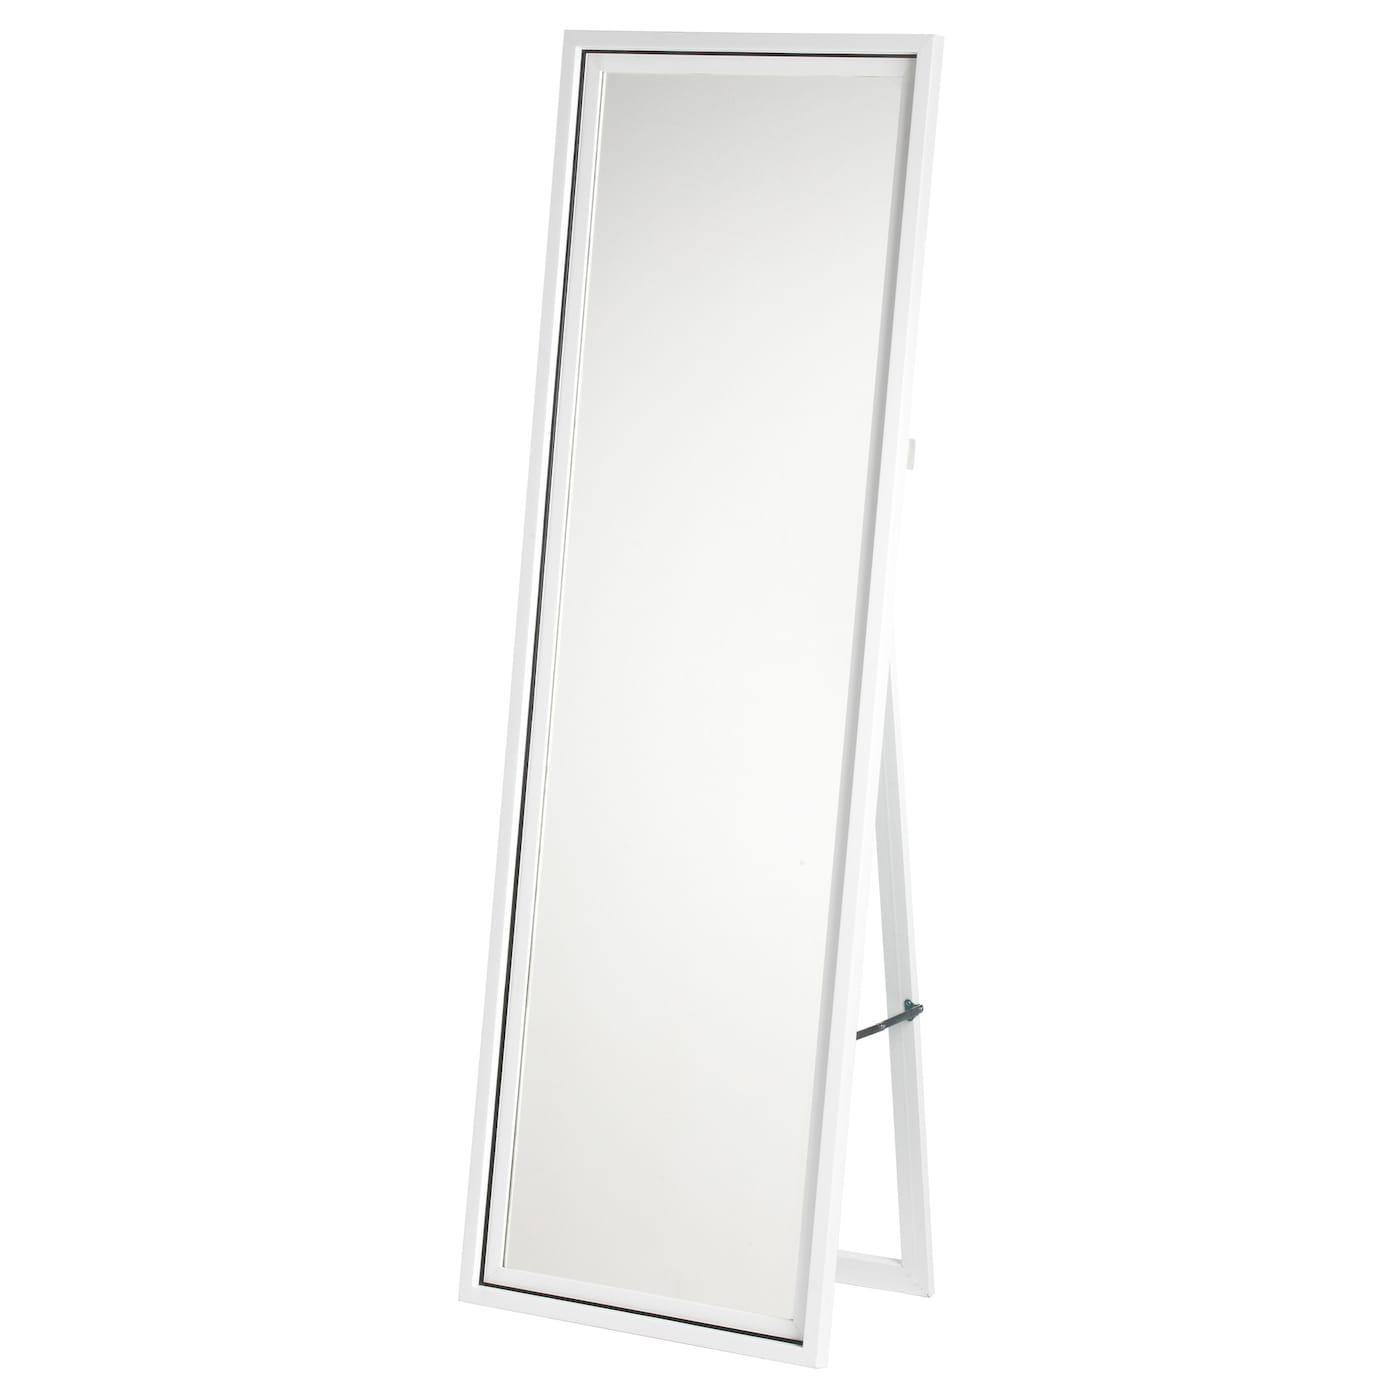 Mirrors ikea ireland dublin for Long standing mirror